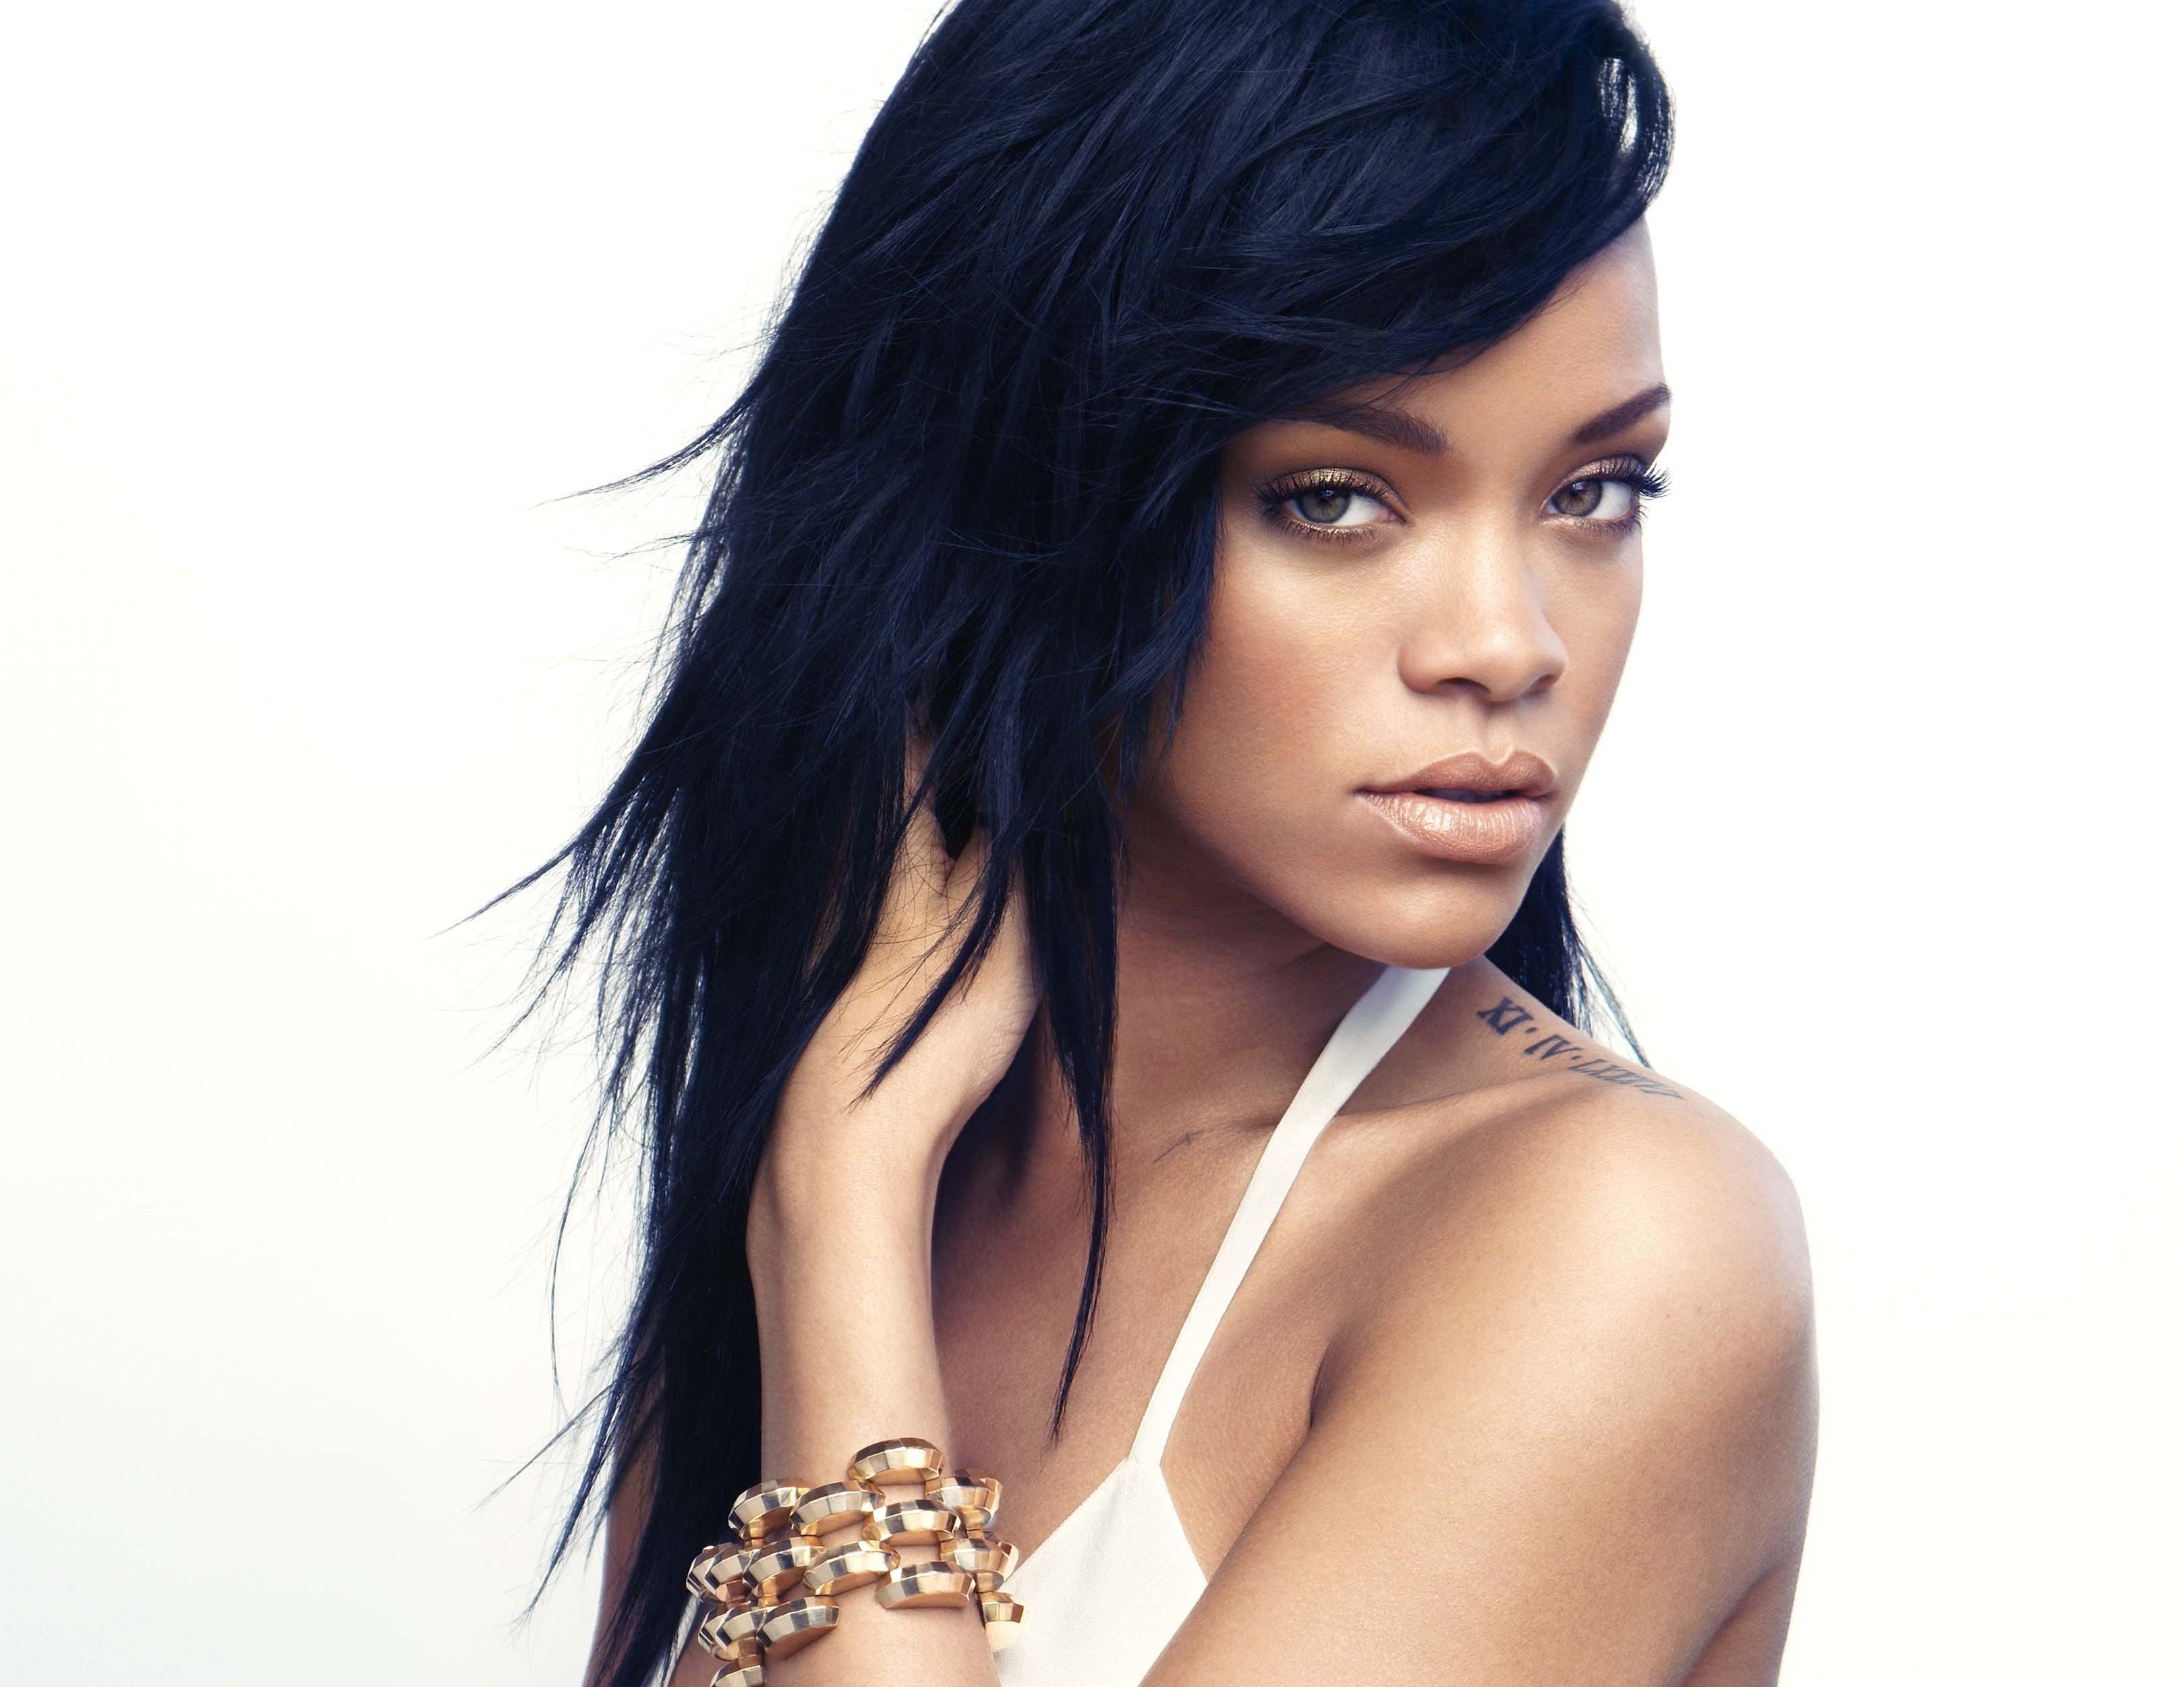 Rihanna full hd wallpaper and background image 3238x2501 id465236 music rihanna barbadian actress fashion designer singer wallpaper voltagebd Gallery